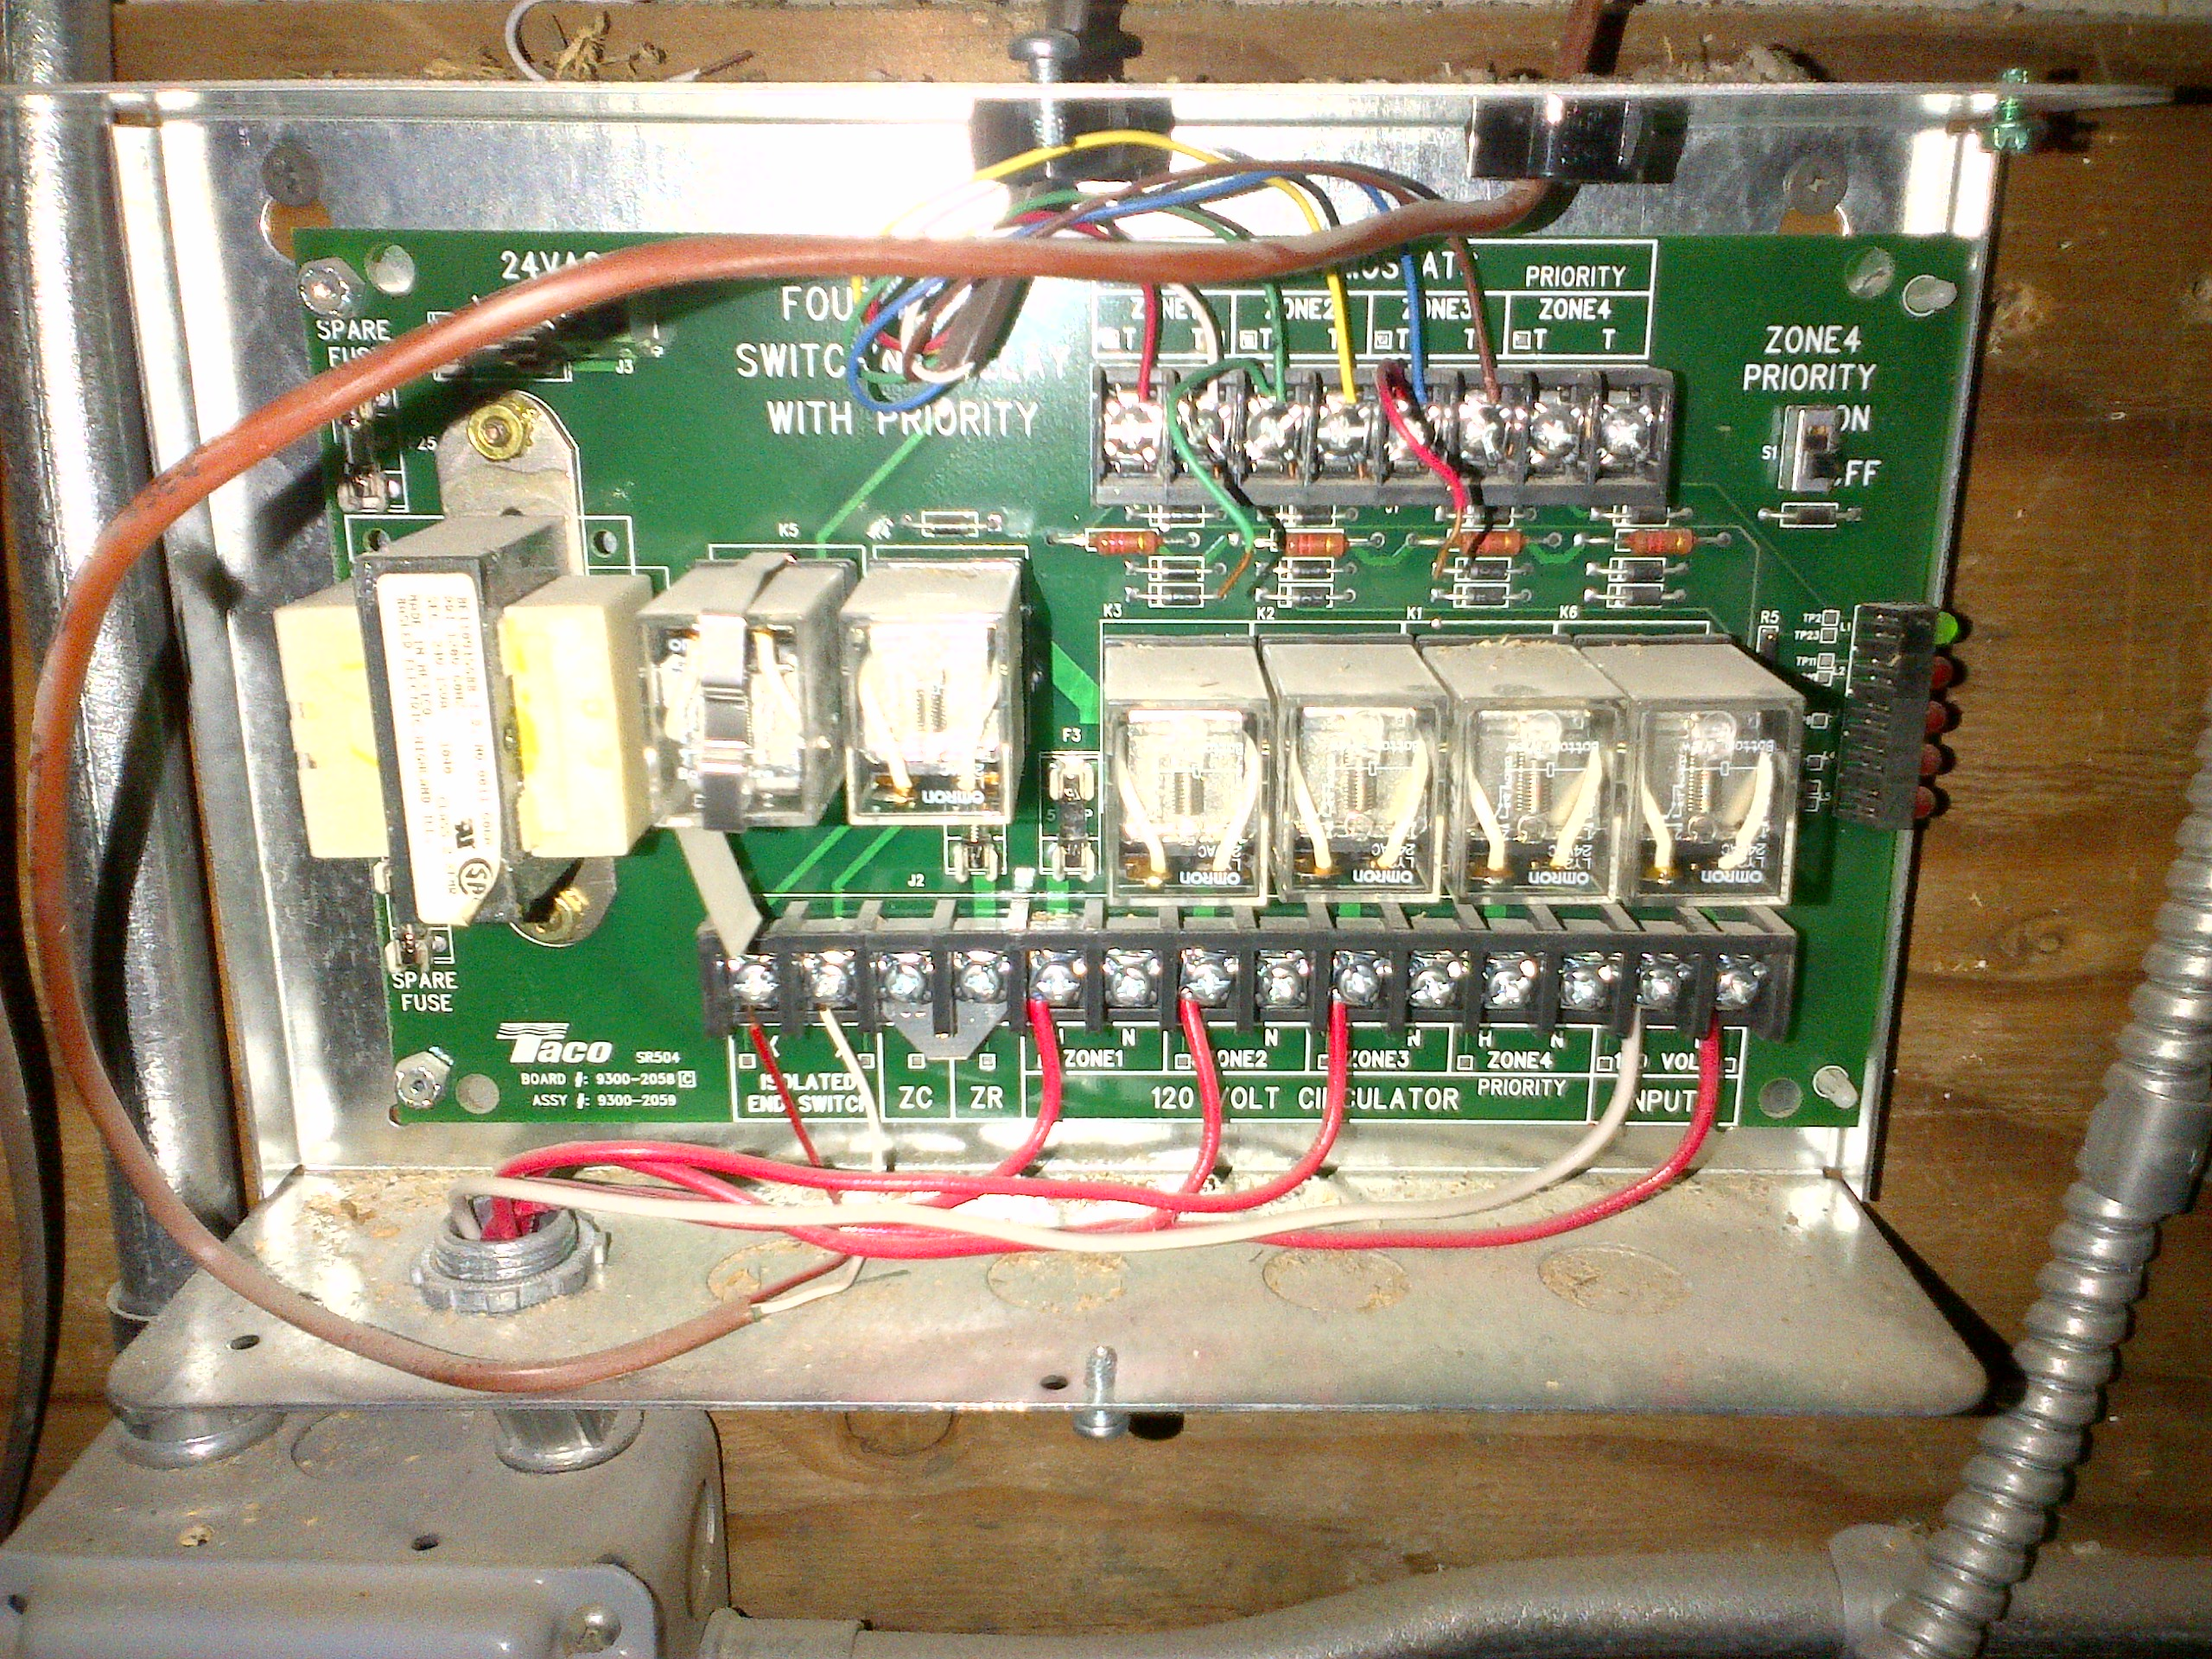 AT_7954] Taco Zone Control Wiring Diagram On Taco 1 Zone Switching Relay  Free DiagramMonoc Xrenket Astic Animo Mepta Mohammedshrine Librar Wiring 101